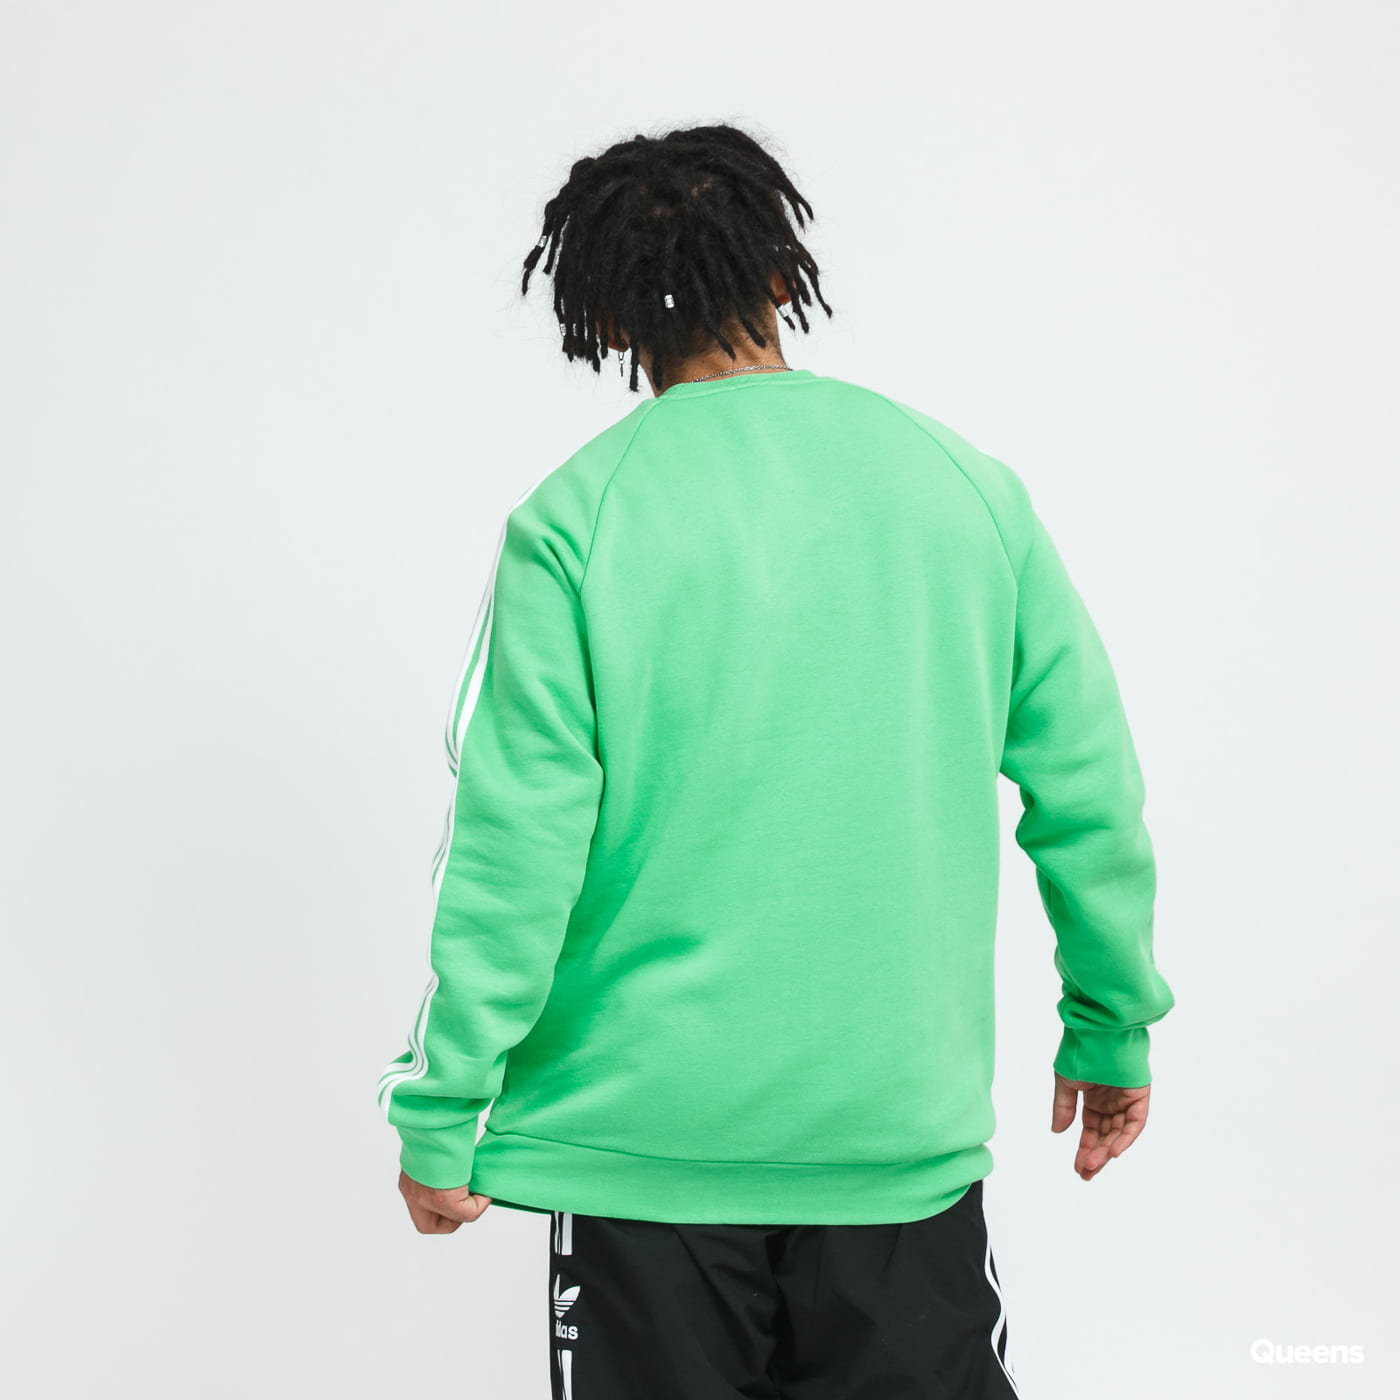 adidas Originals 3-Stripes Crew green